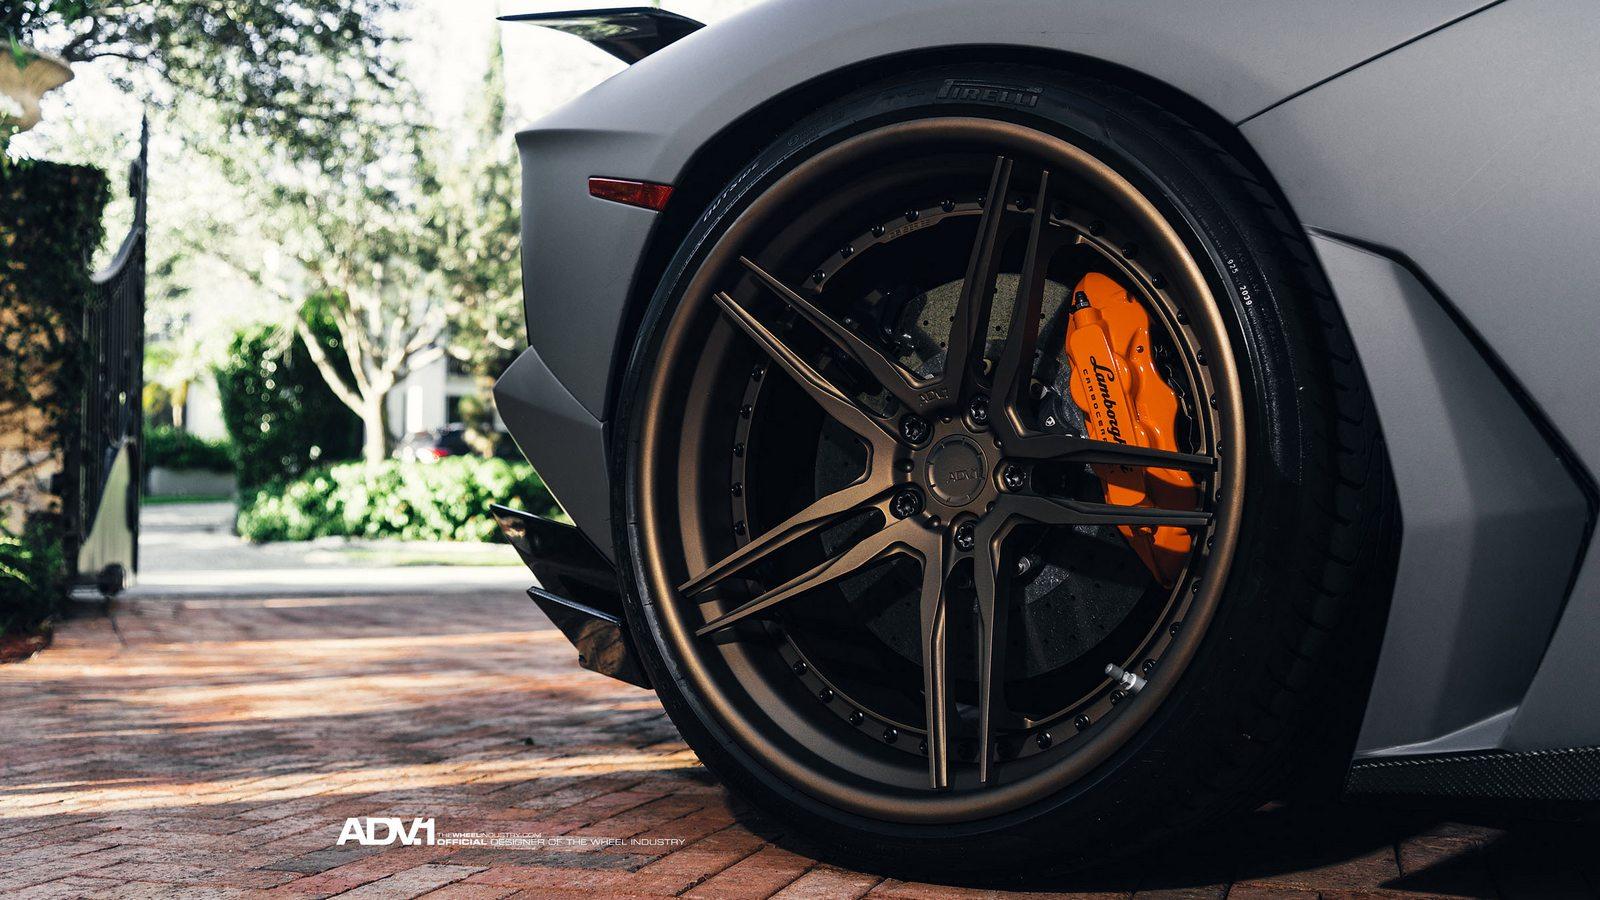 lamborghini-aventador-tuning-novitec-torado-adv1-wheels-7